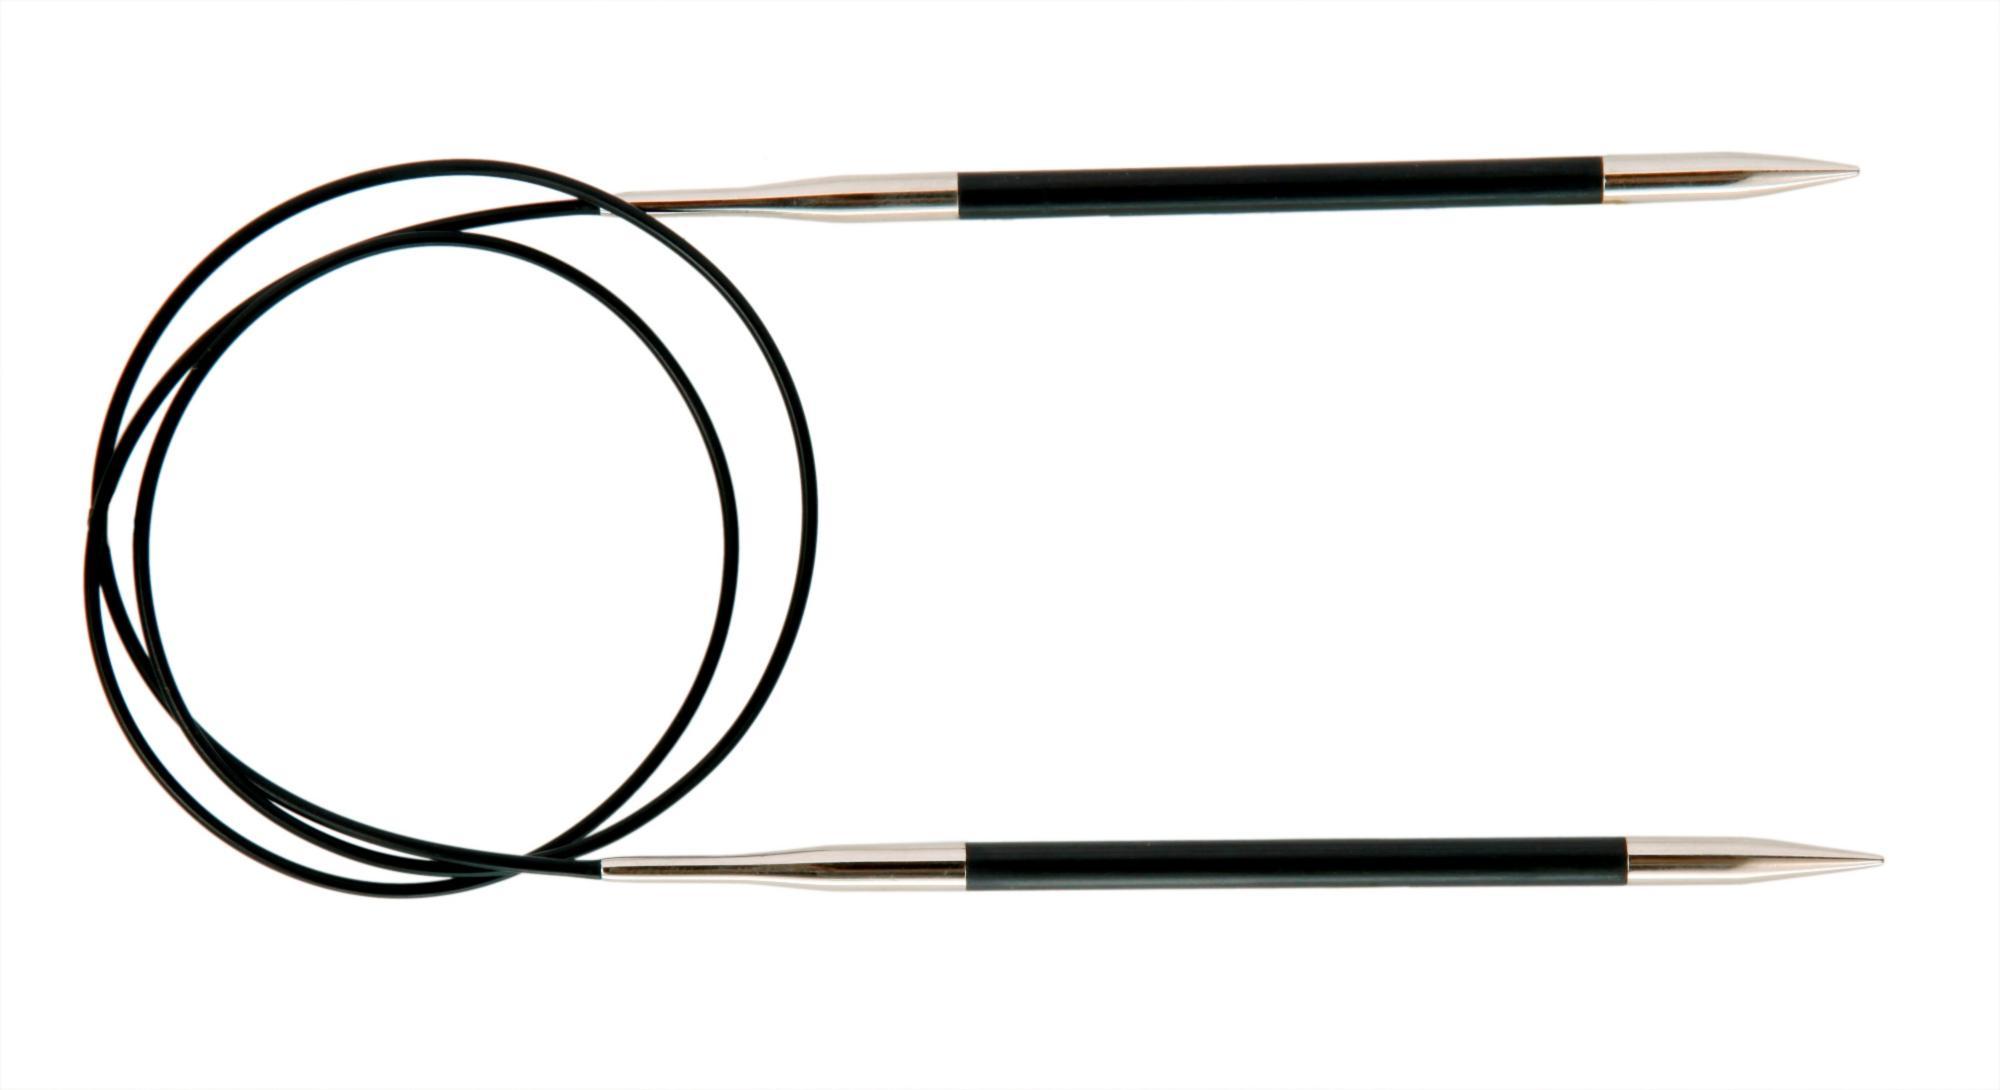 Спицы круговые 100 см Karbonz KnitPro, 41205, 3.00 мм